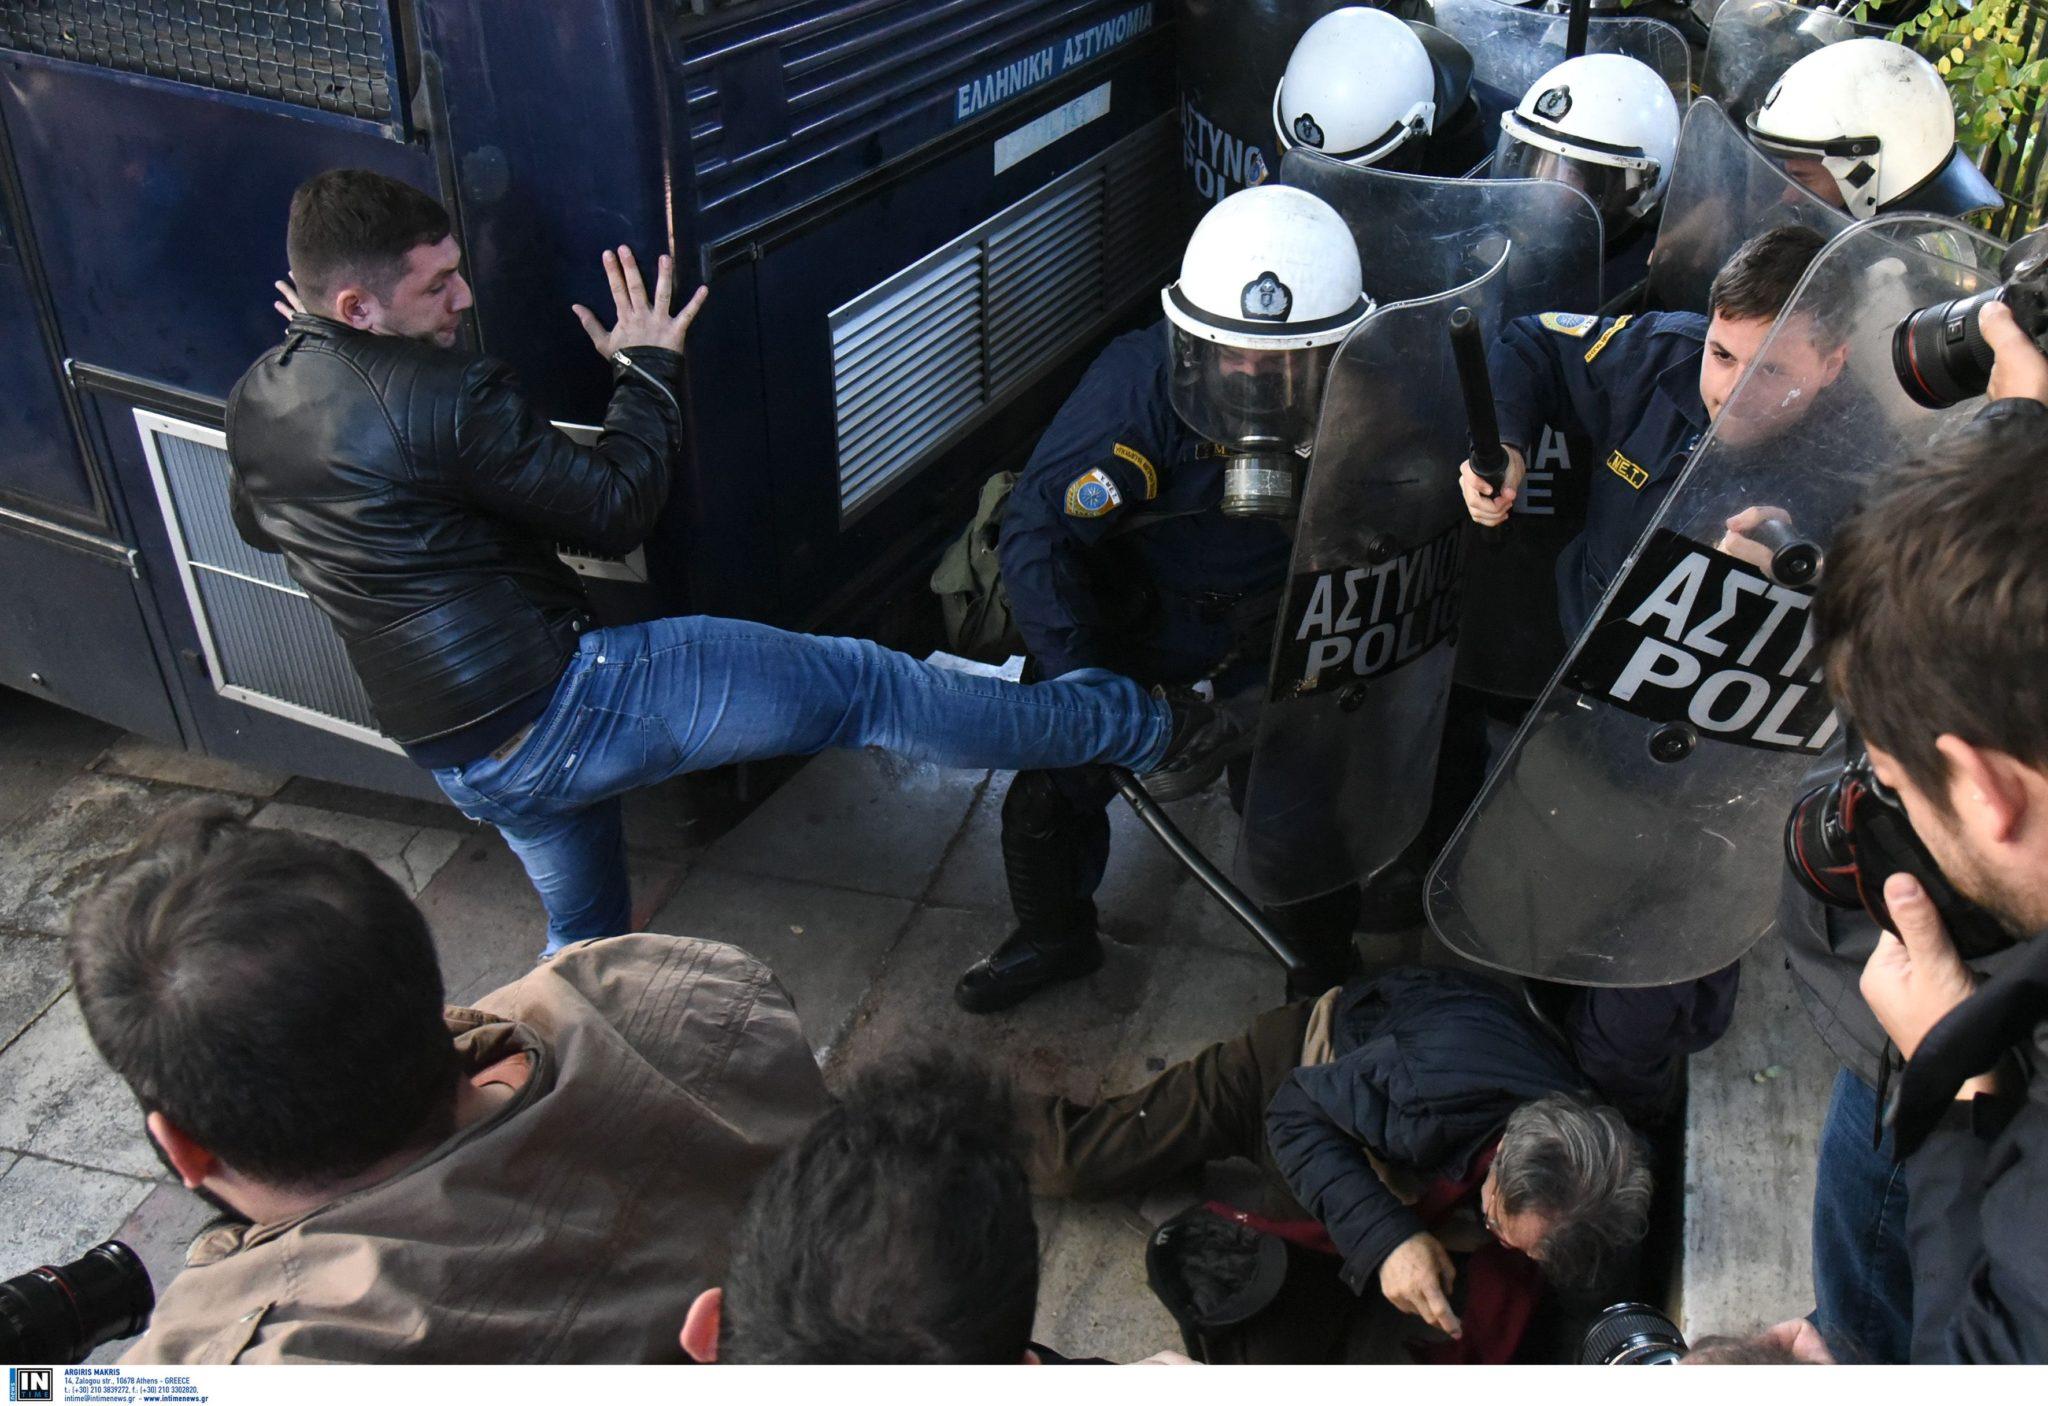 Photo of Ξύλο με τα ΜΑΤ έξω από του Μαξίμου και προσπάθεια εισβολής στη Βουλή…Αγριεύουν τα πραγματα